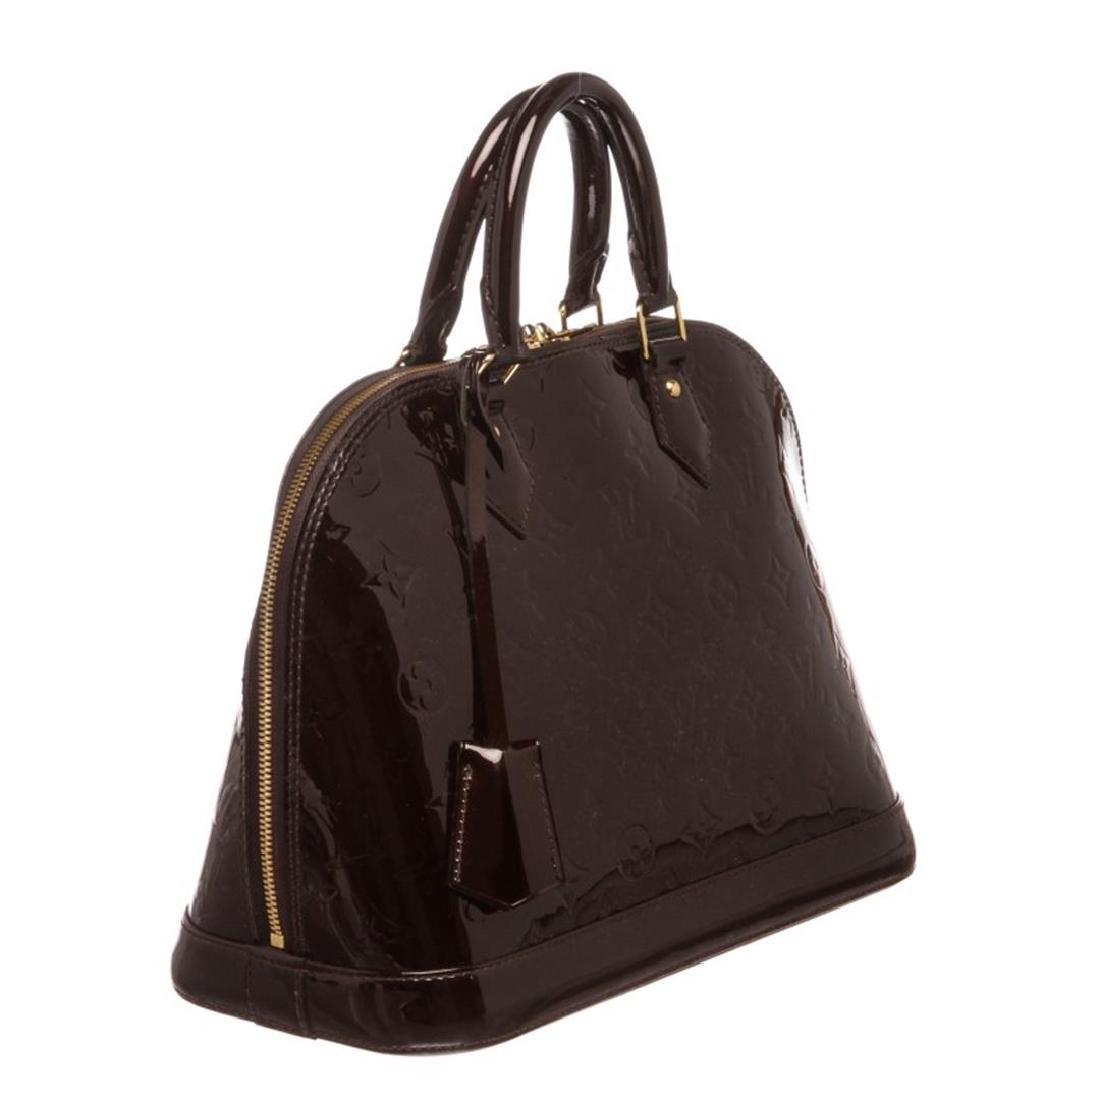 Louis Vuitton Vernis Amarante Leather Monogram Alma PM